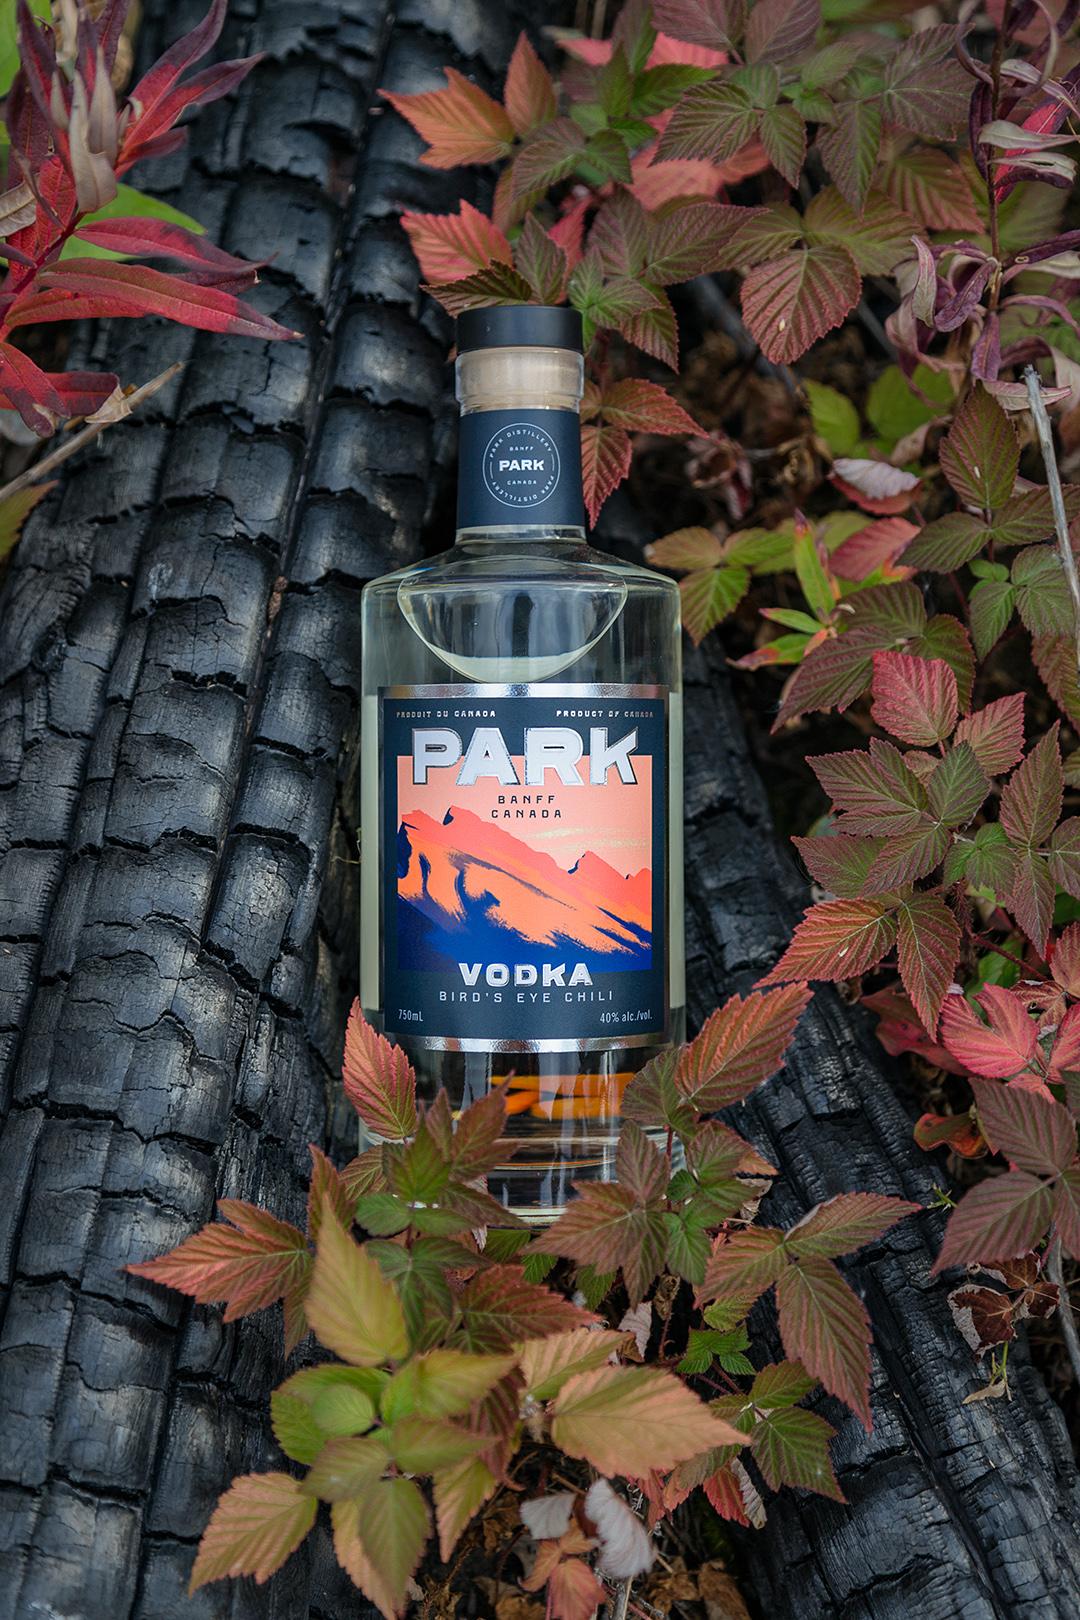 Chili Vodka Burnt Trees | Photo Credit: Lindsay Smith